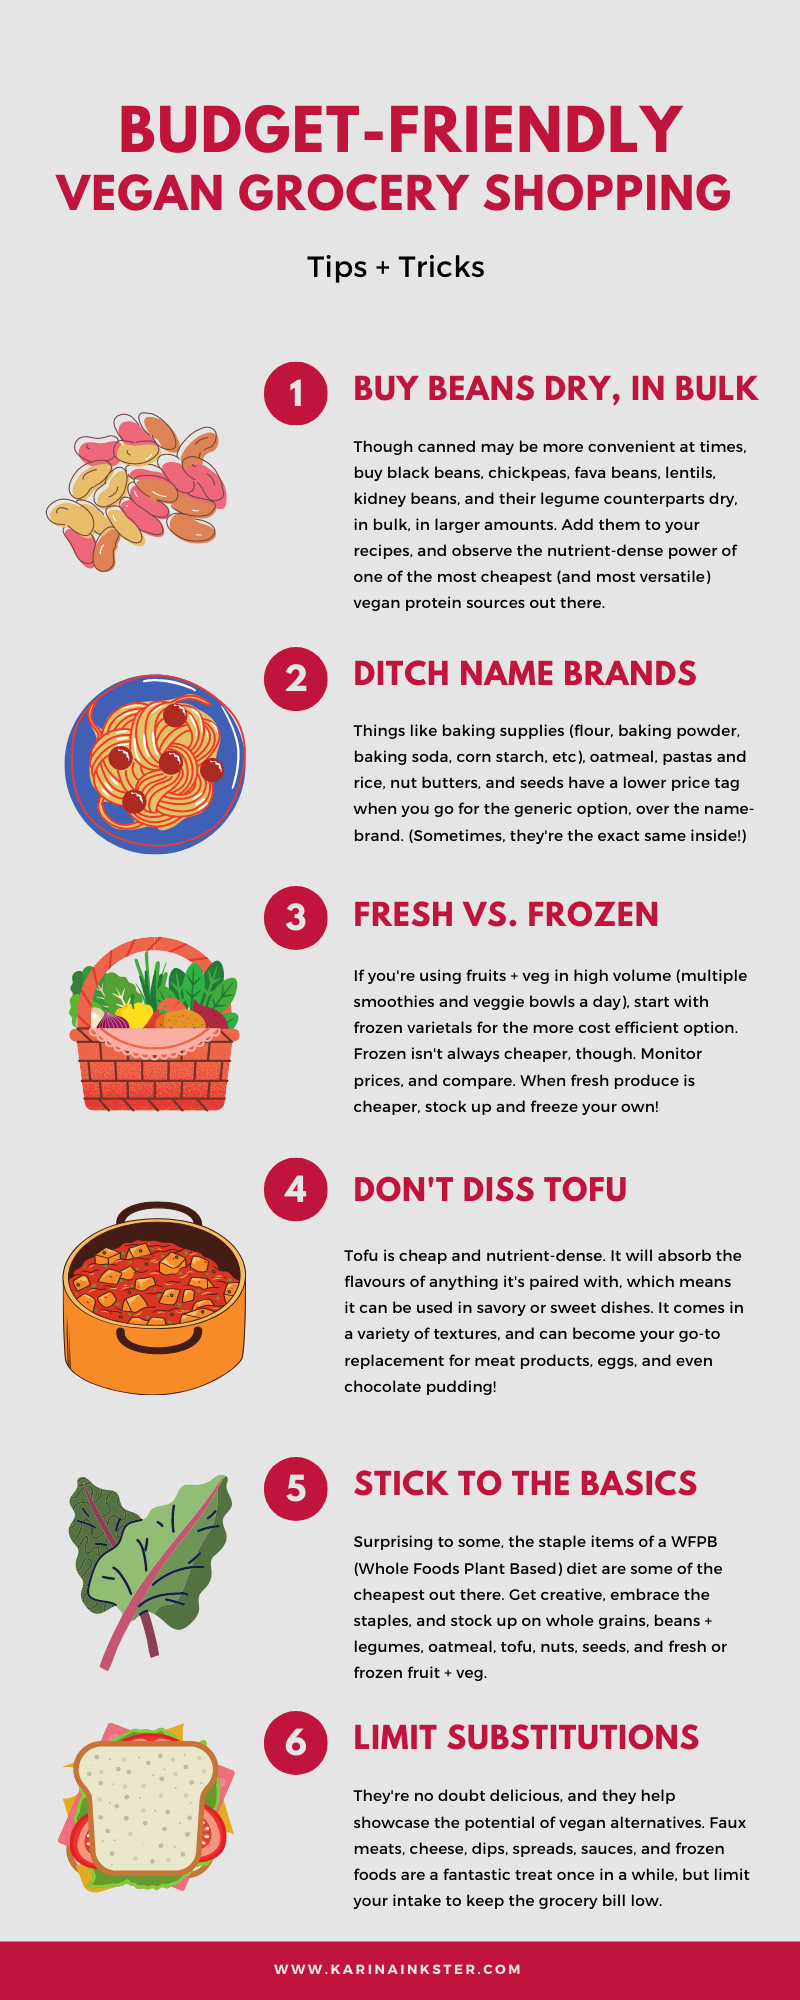 Budget-friendly vegan grocery shopping tips